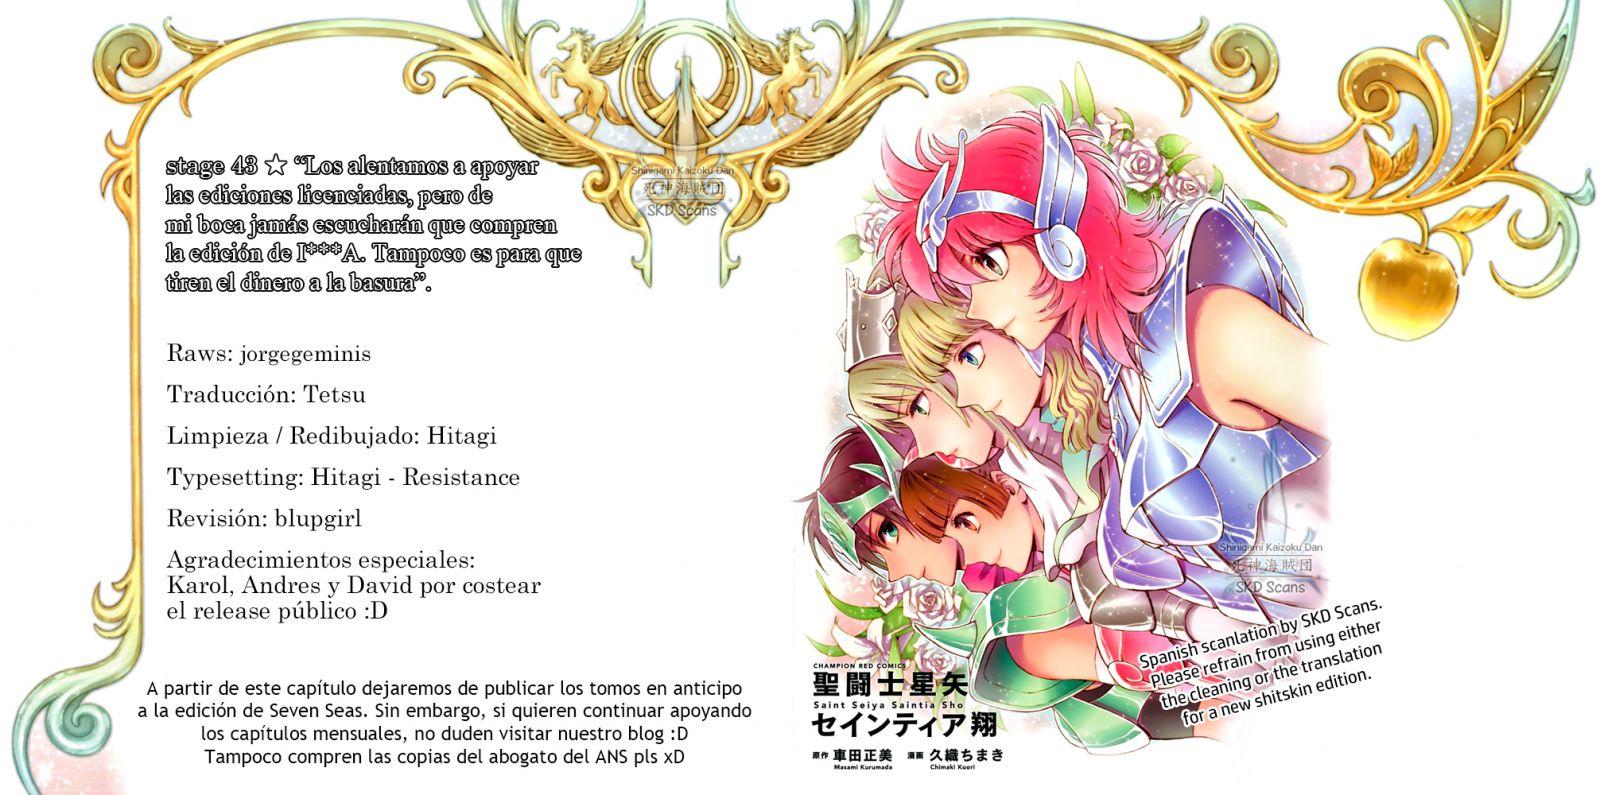 https://c9.mangatag.com/es_manga/pic3/33/5601/590105/ec2b2ded4a1e9aea87d449c0a773bb6f.jpg Page 1